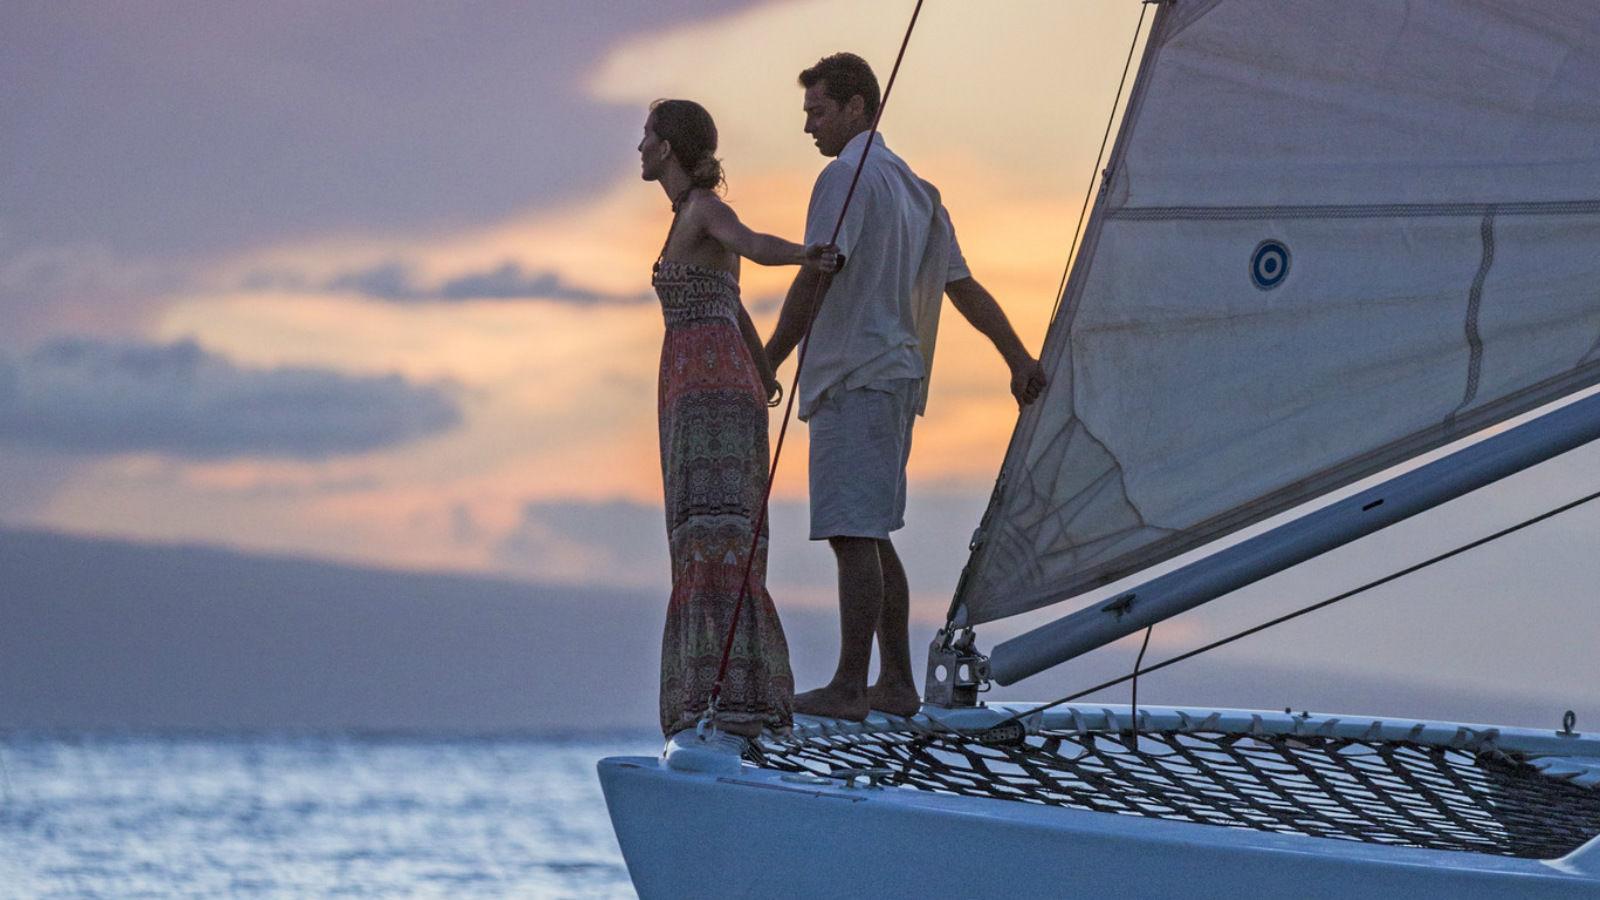 santoline_catamaran-1